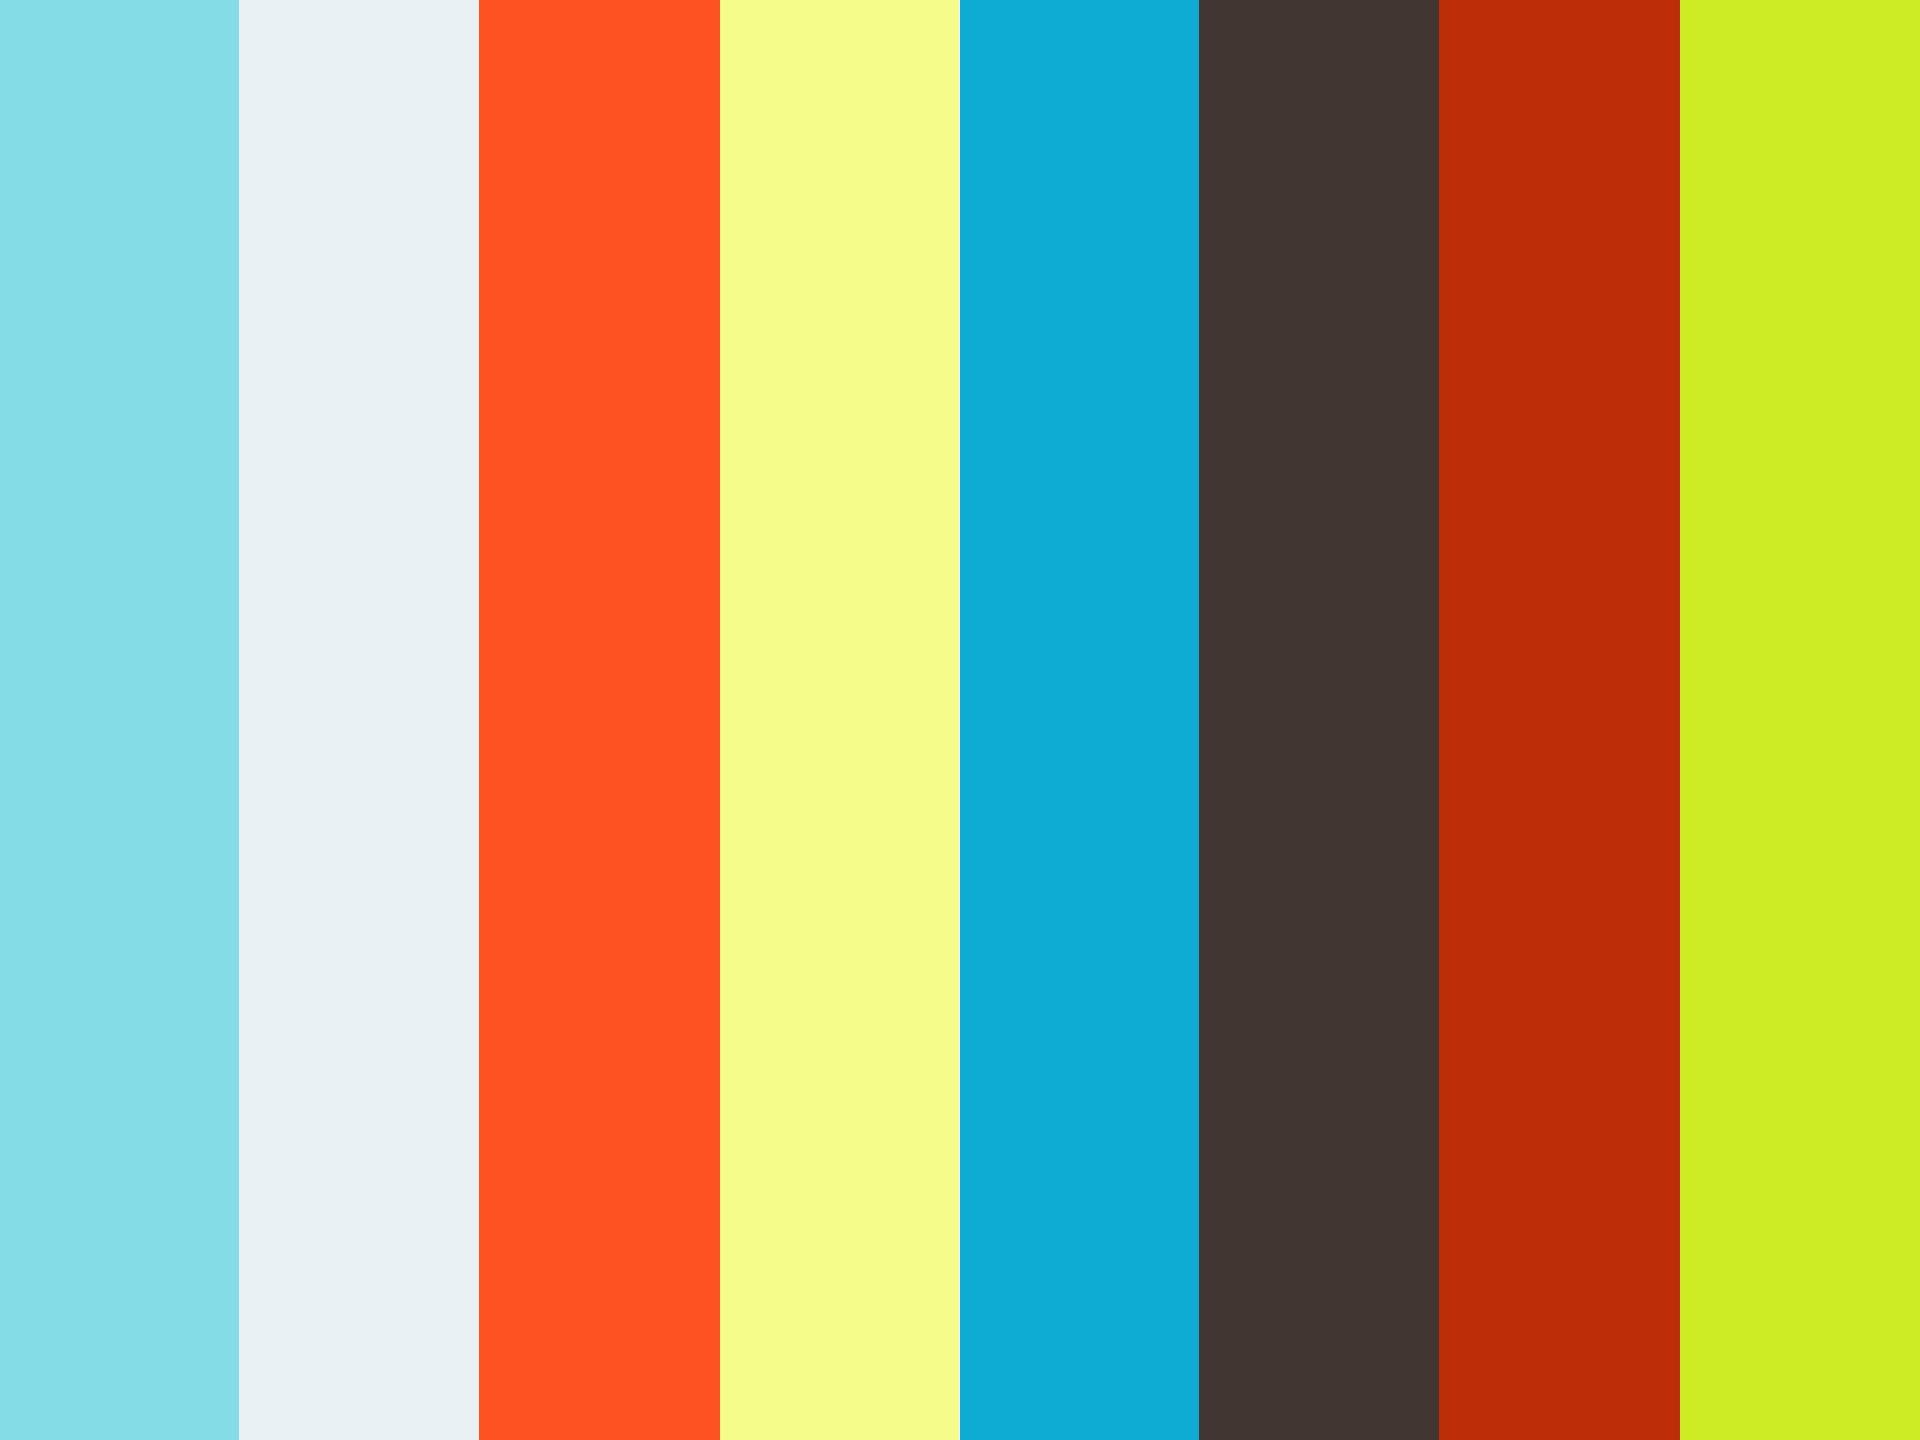 Overlay?src0=https%3a%2f%2fi.vimeocdn.com%2fvideo%2f709441763 1280x720.jpg&src1=https%3a%2f%2ff.vimeocdn.com%2fimages v6%2fshare%2fplay icon overlay